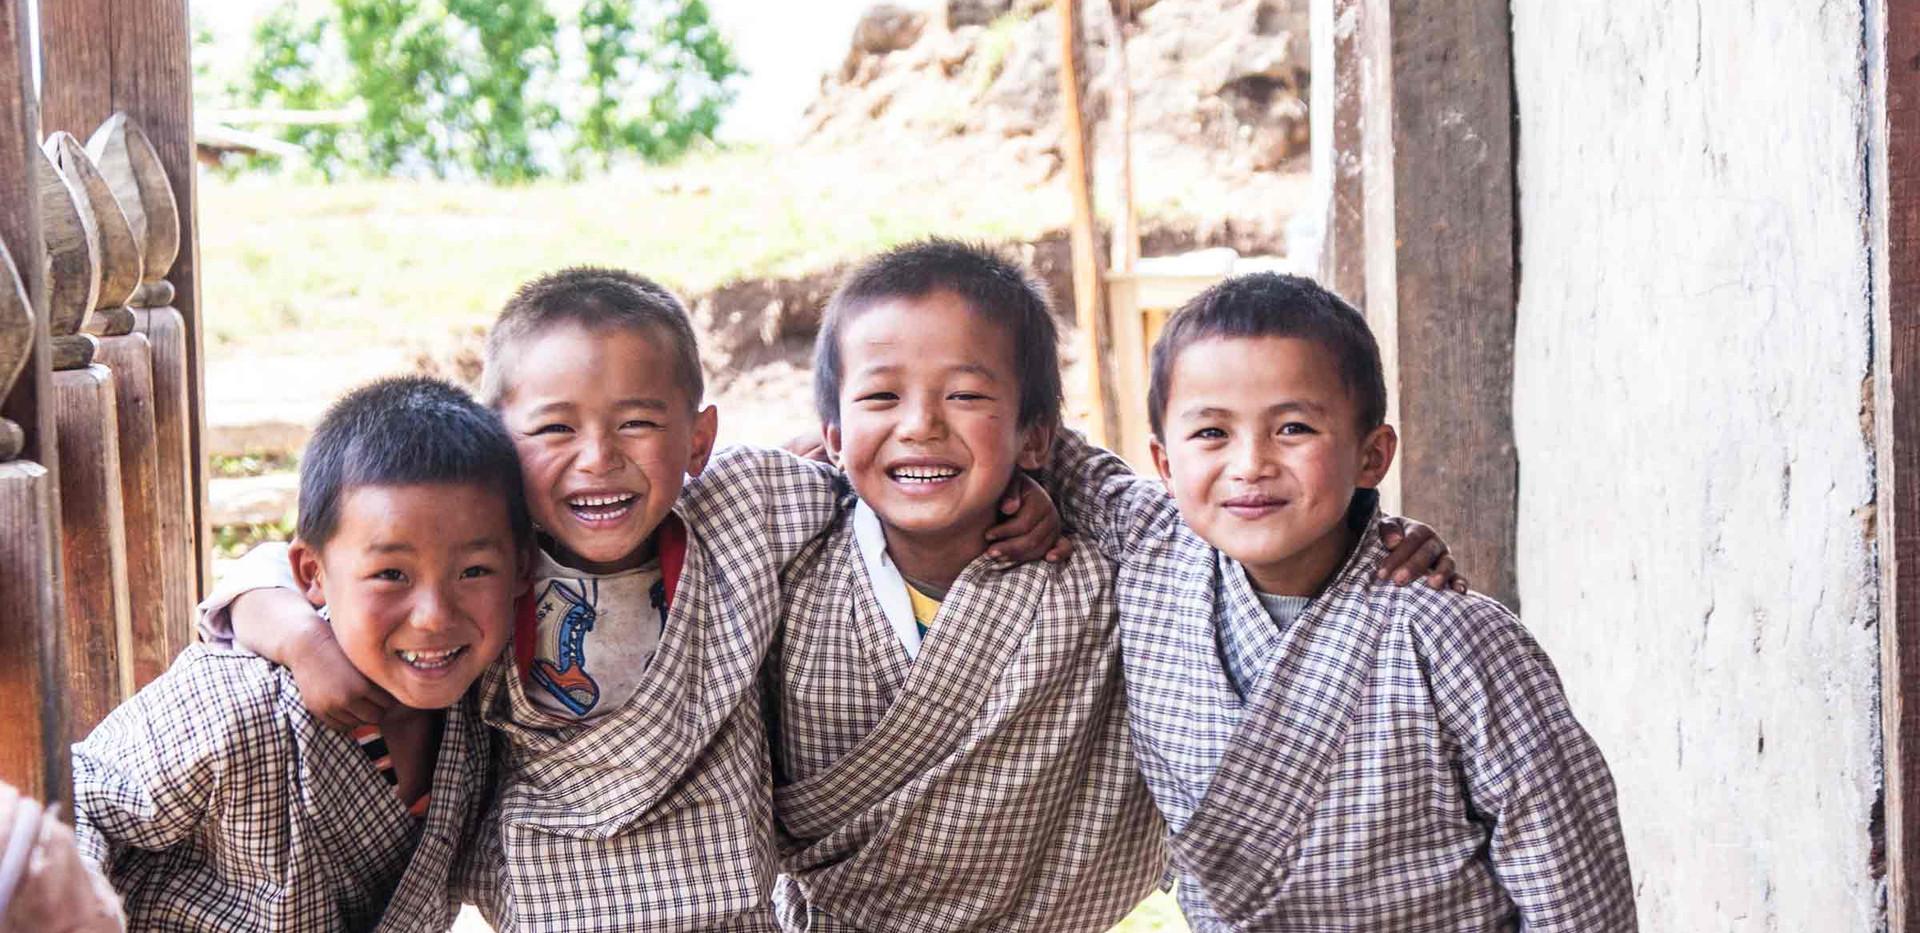 laughing-schoolboys-central-bhutan.jpg